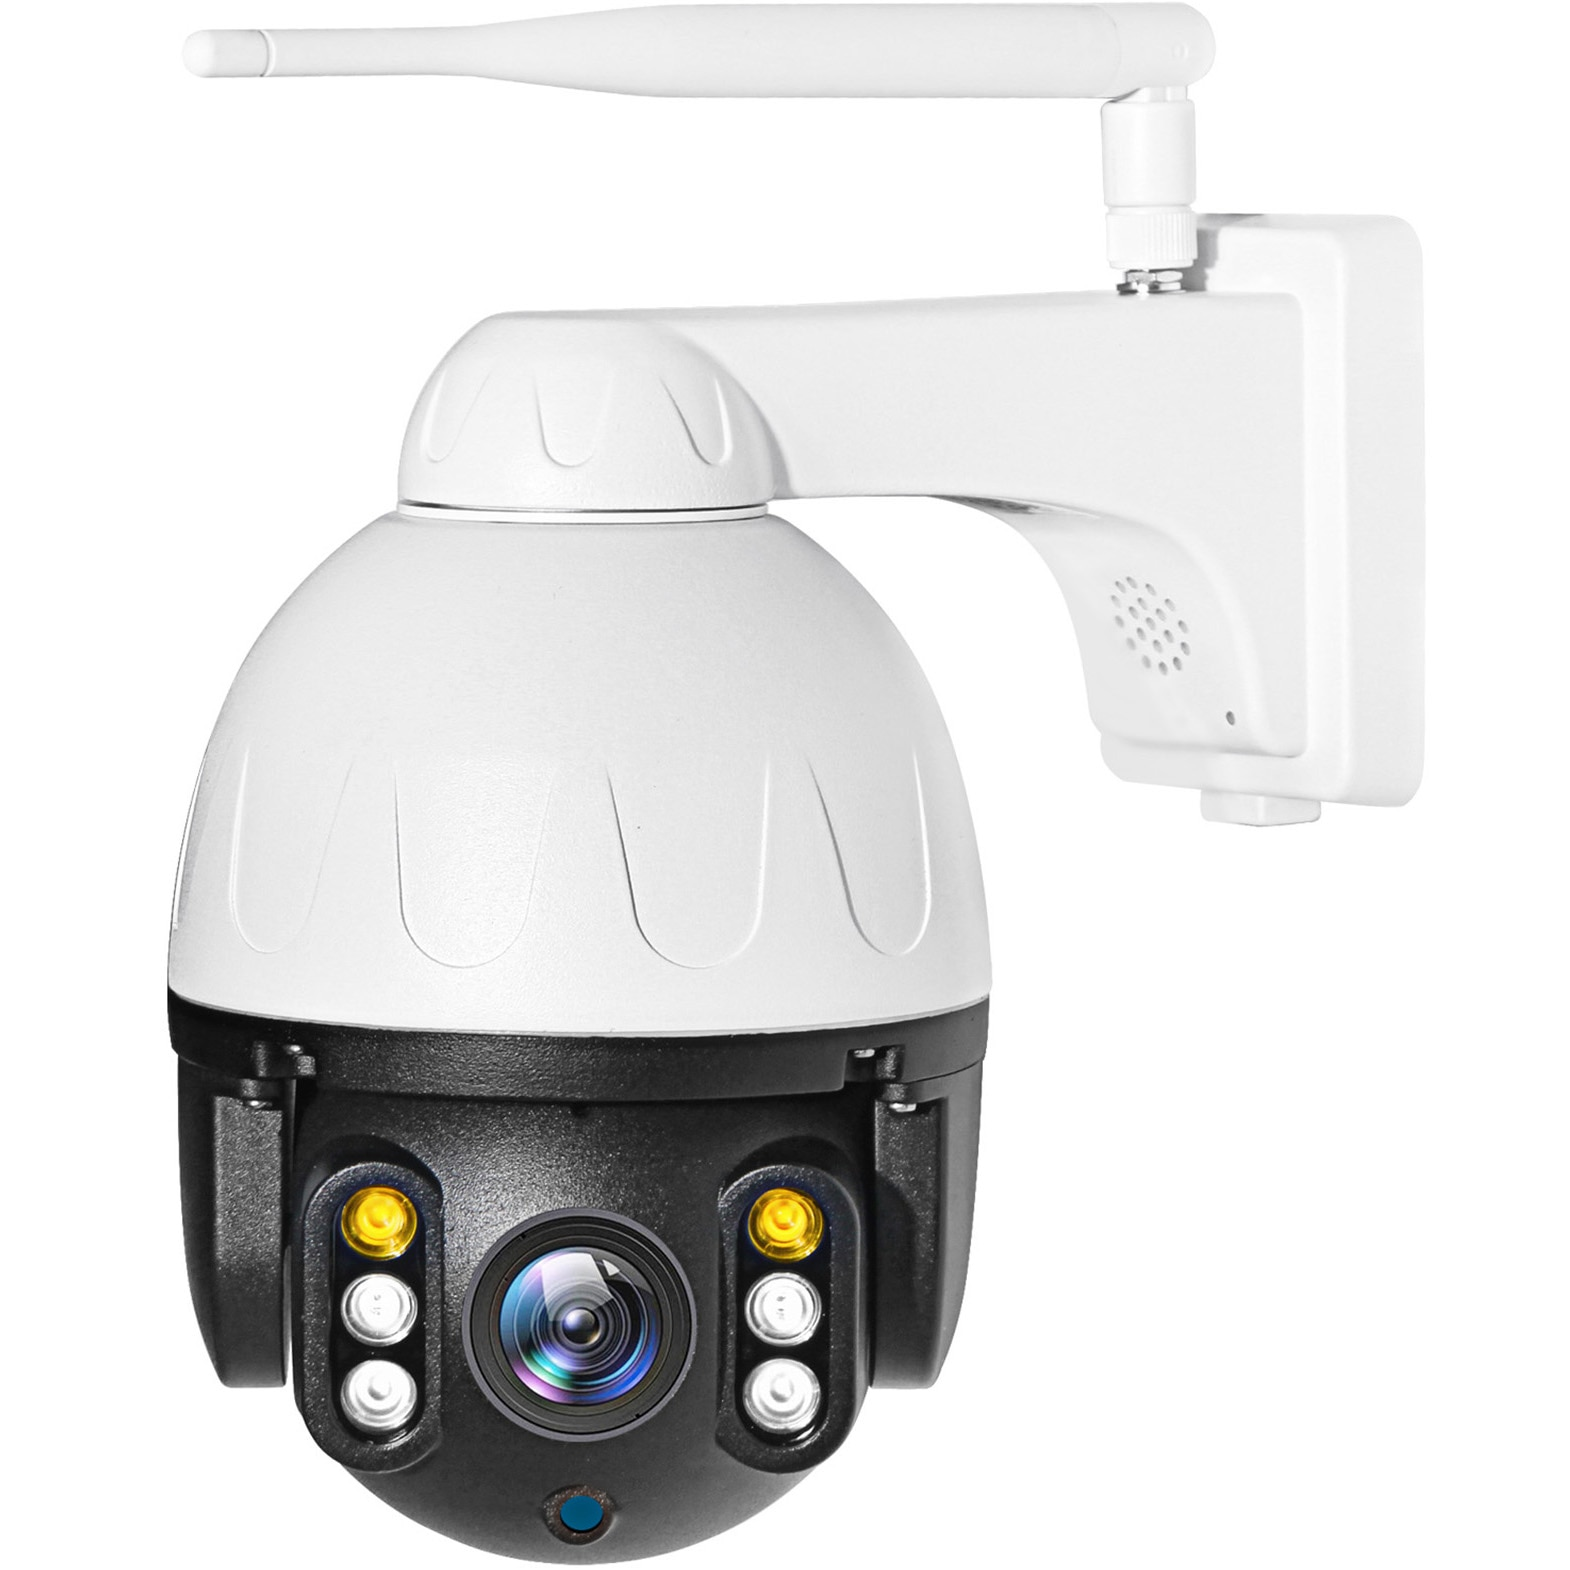 Fotografie Camera supraveghere video PNI SafeHome PTZ382 1080P WiFi, control prin internet, aplicatie dedicata Tuya Smart, integrare in scenarii si automatizari smart cu alte produse compatibile Tuya